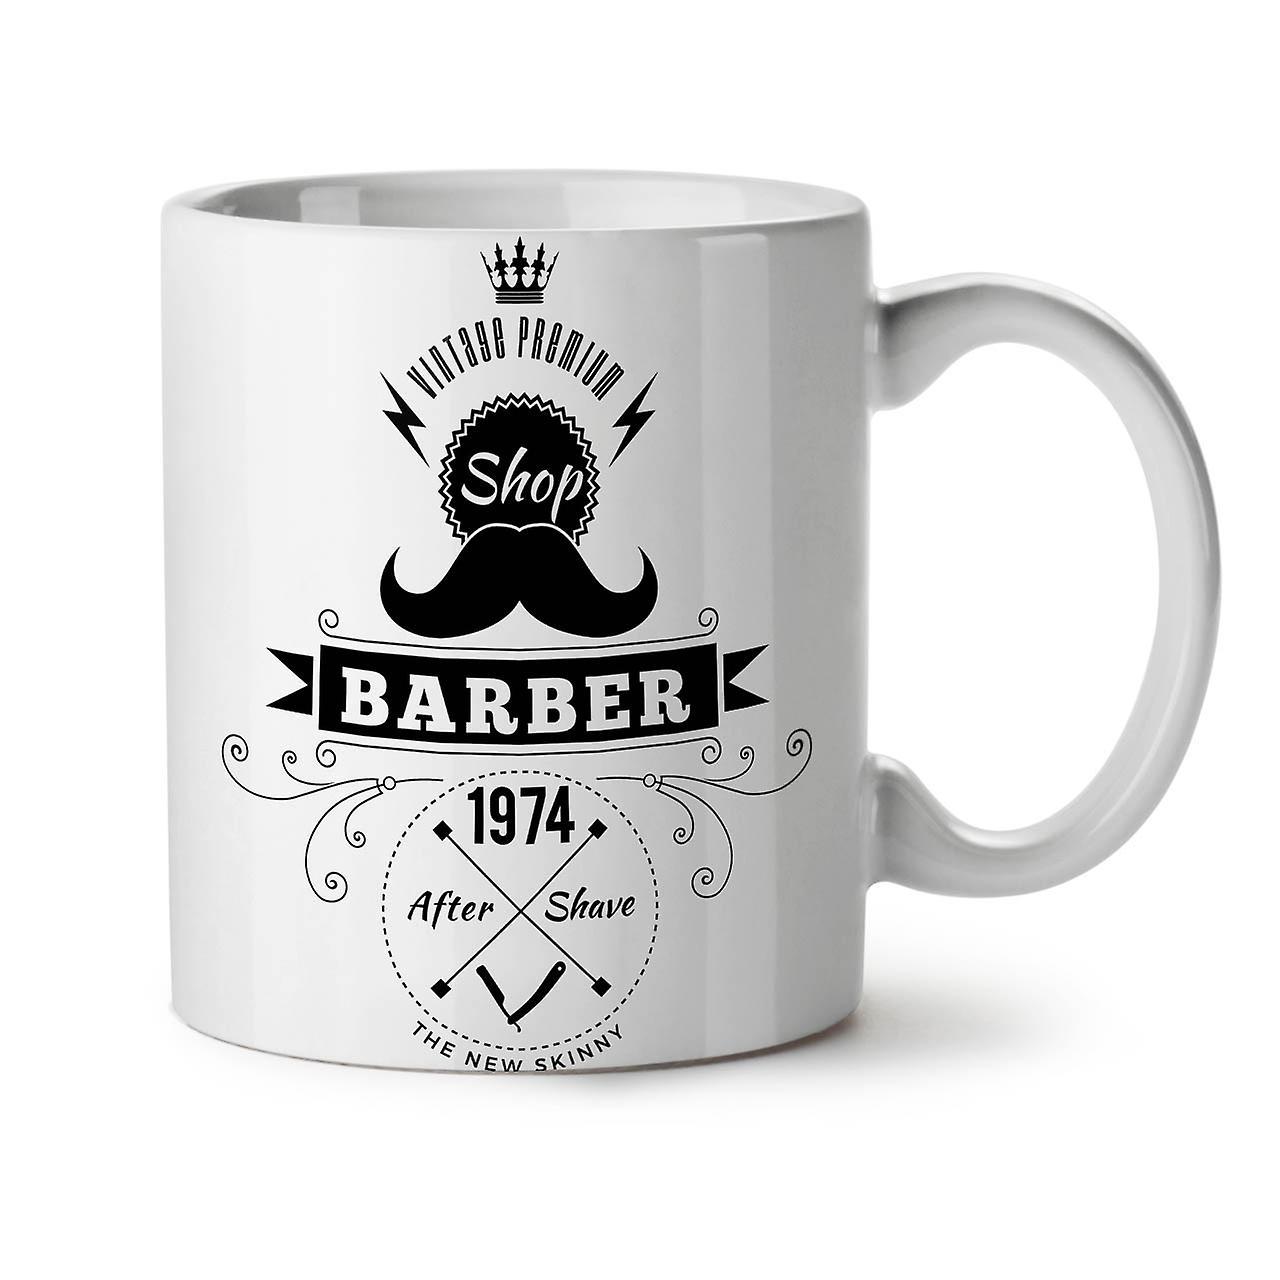 Blanc Tasse Café OzWellcoda Shop Thé 11 Barber Céramique Nouveau D9YWEHI2